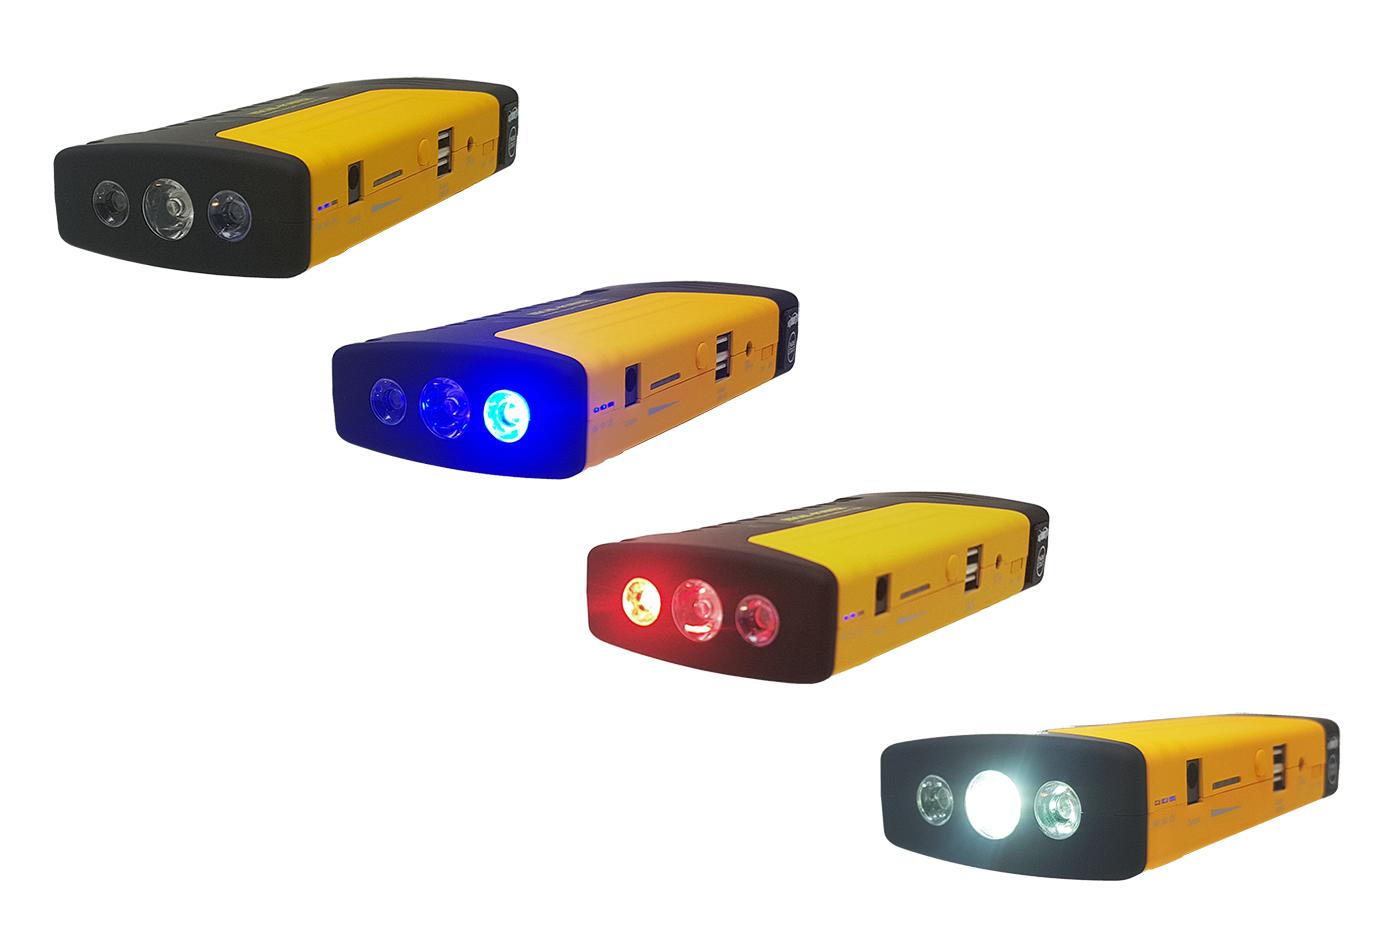 Plafoniera Con Kit Emergenza : Kit tci per luce emergenza power e moduli led v ma